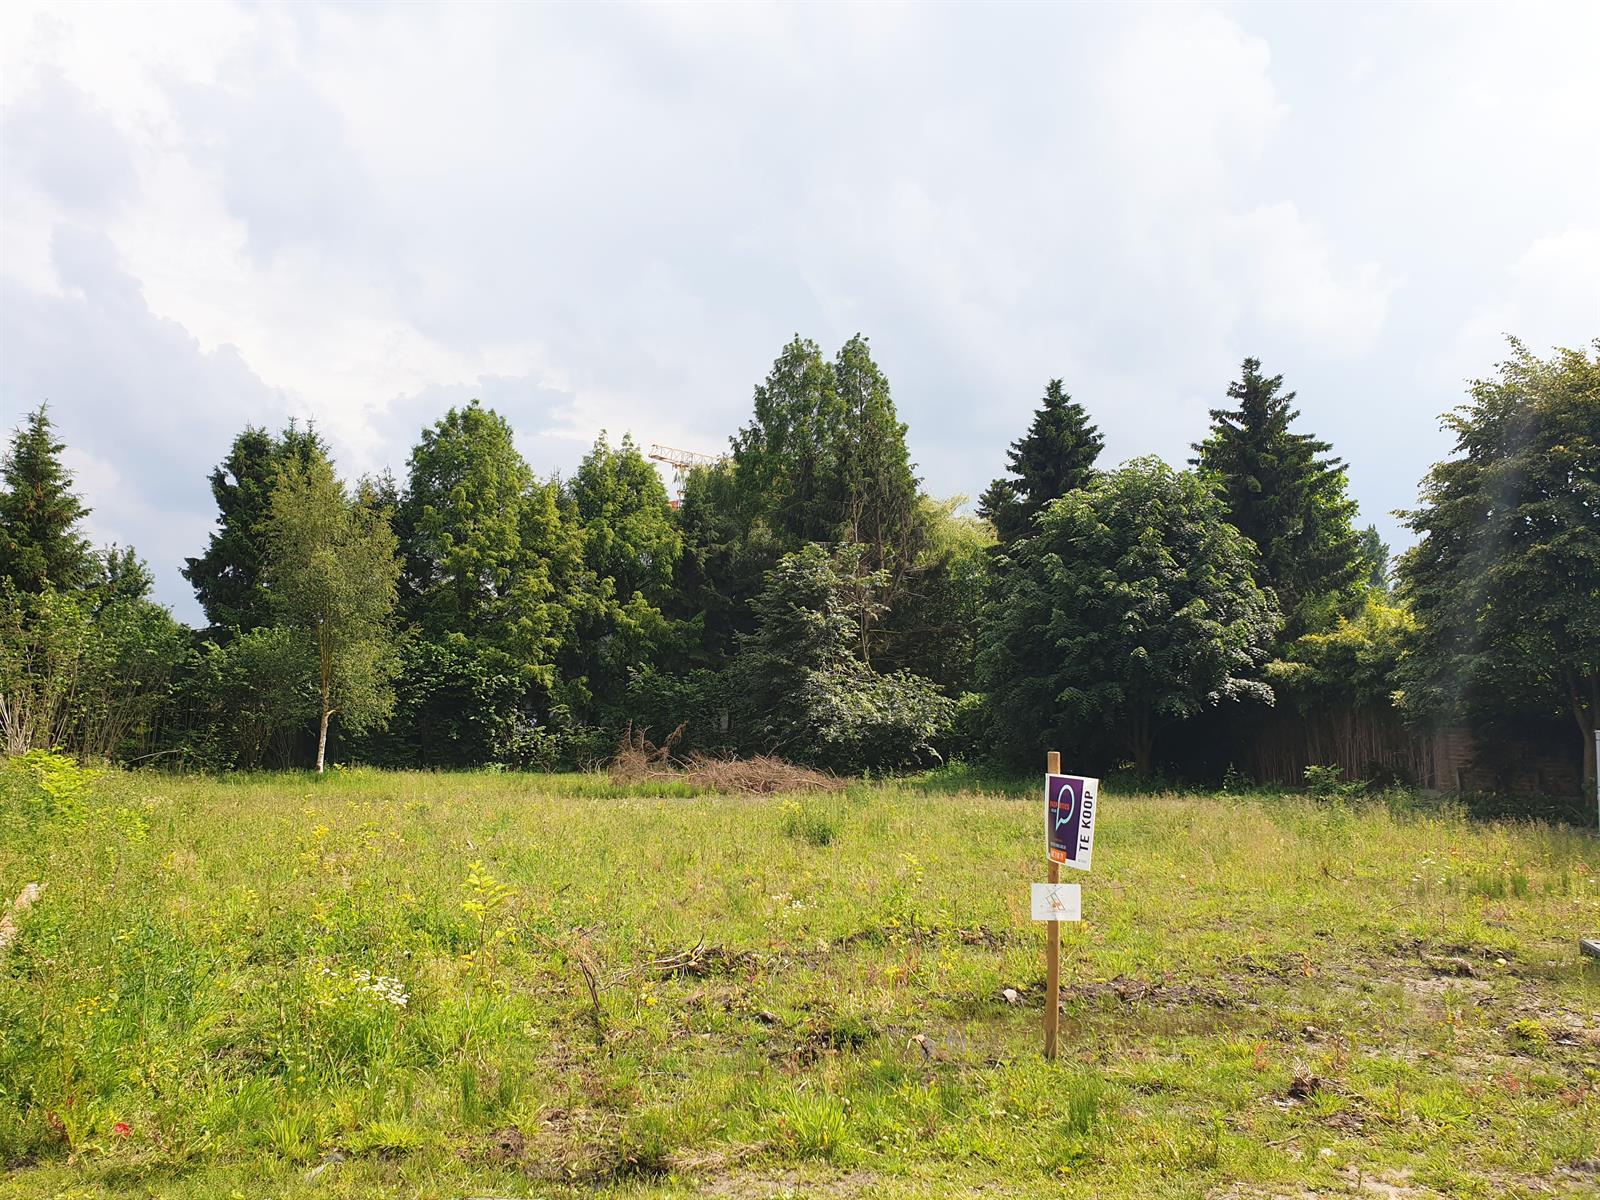 Bouwgrond nabij het bos in Latem